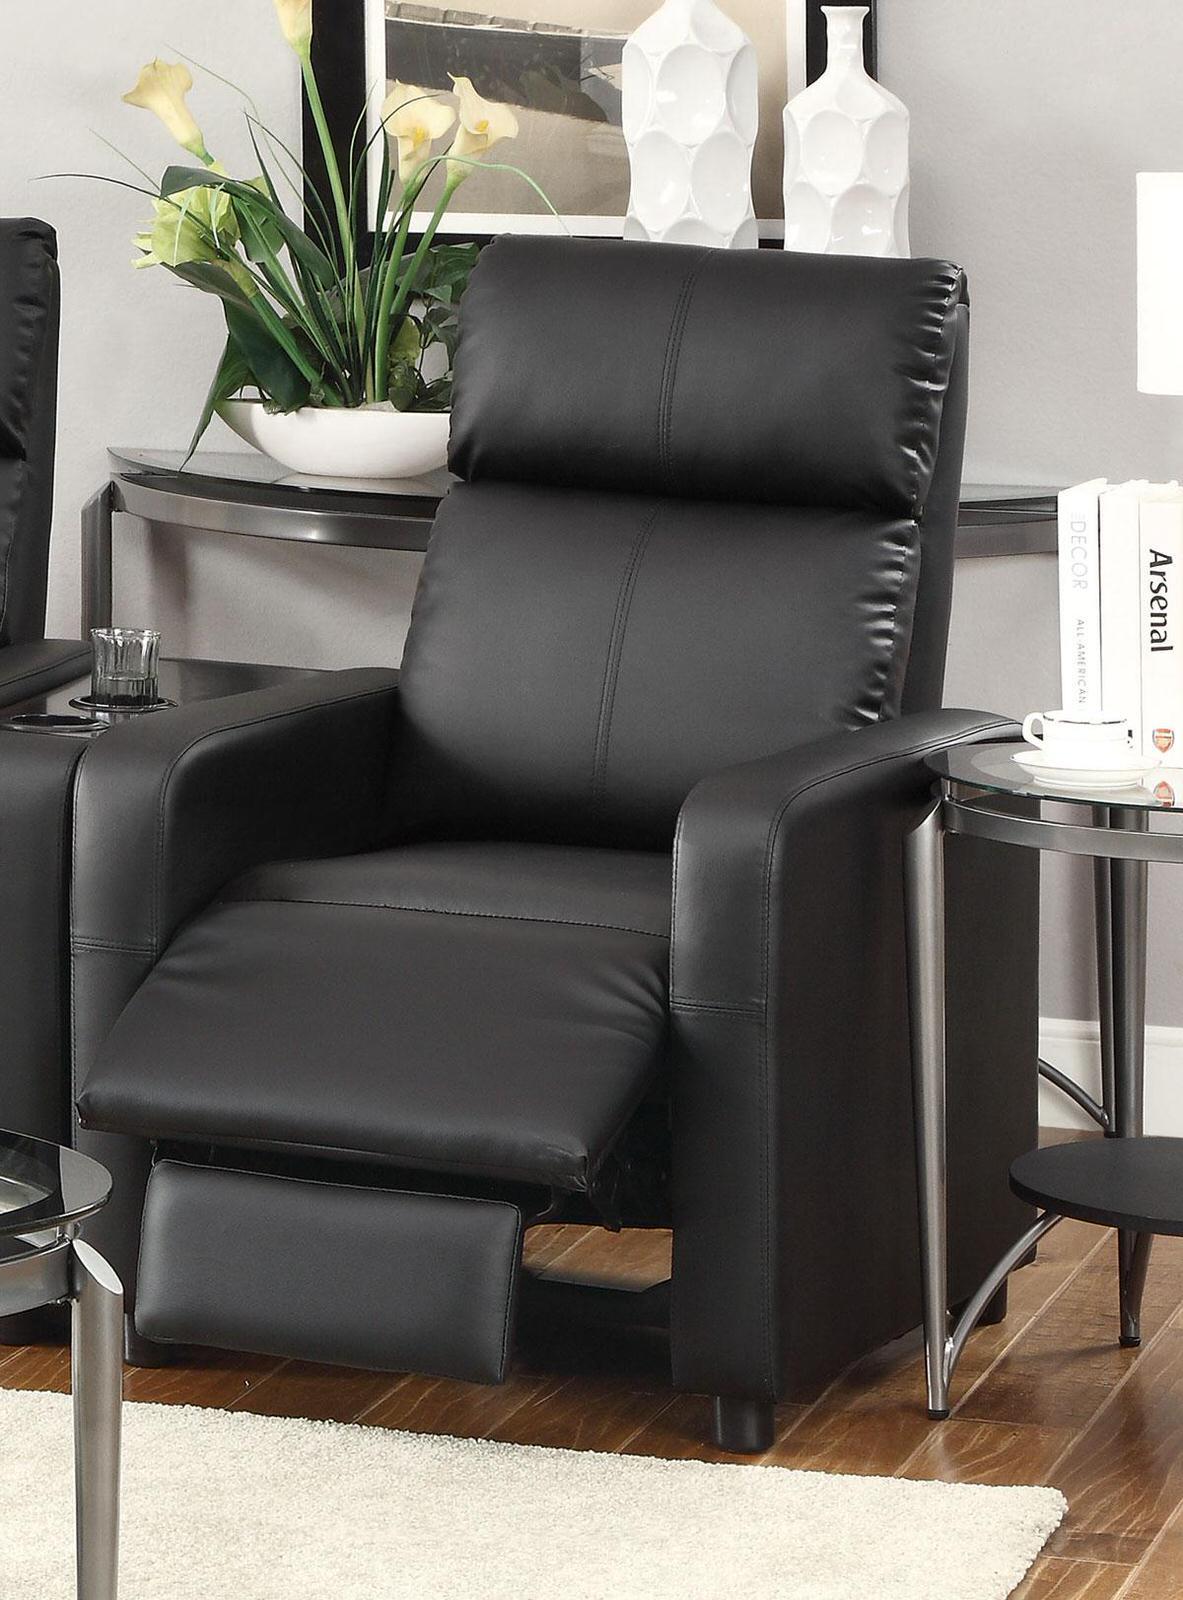 600181 push back chair recliner black vinyl by coaster coaster fine furniture